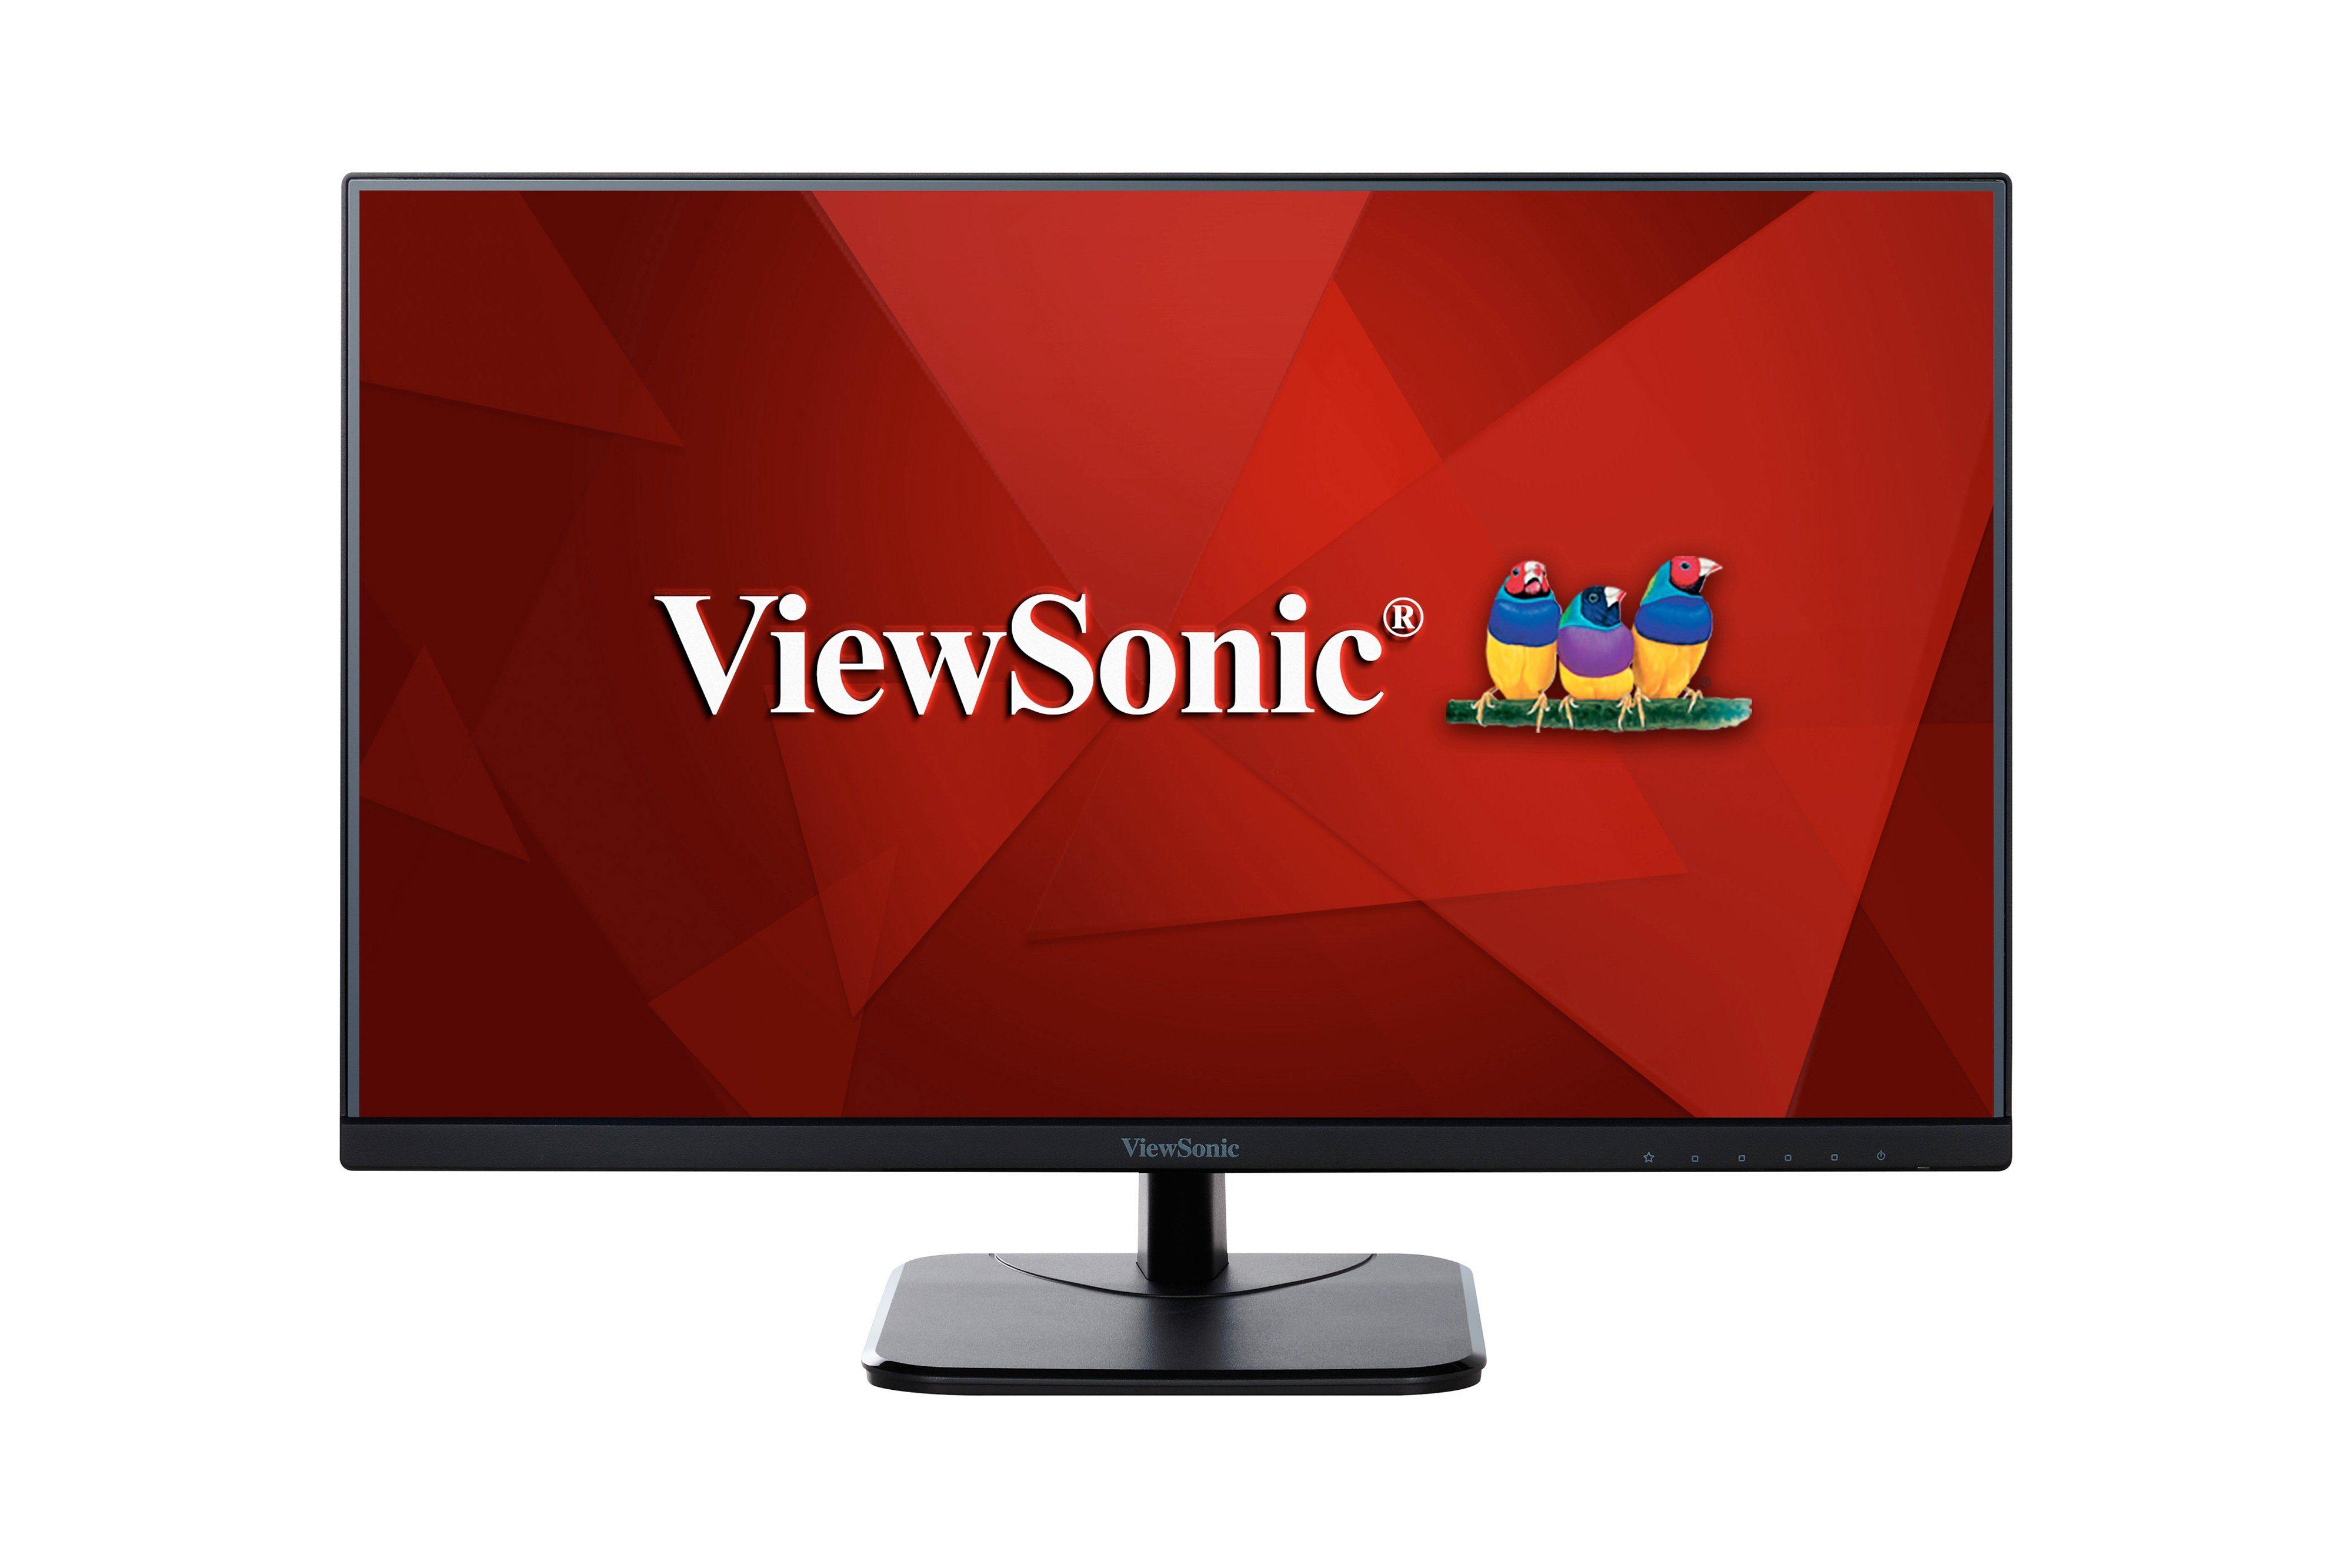 ViewSonic Desktop Displays »27IN LED MONITOR 16:9«